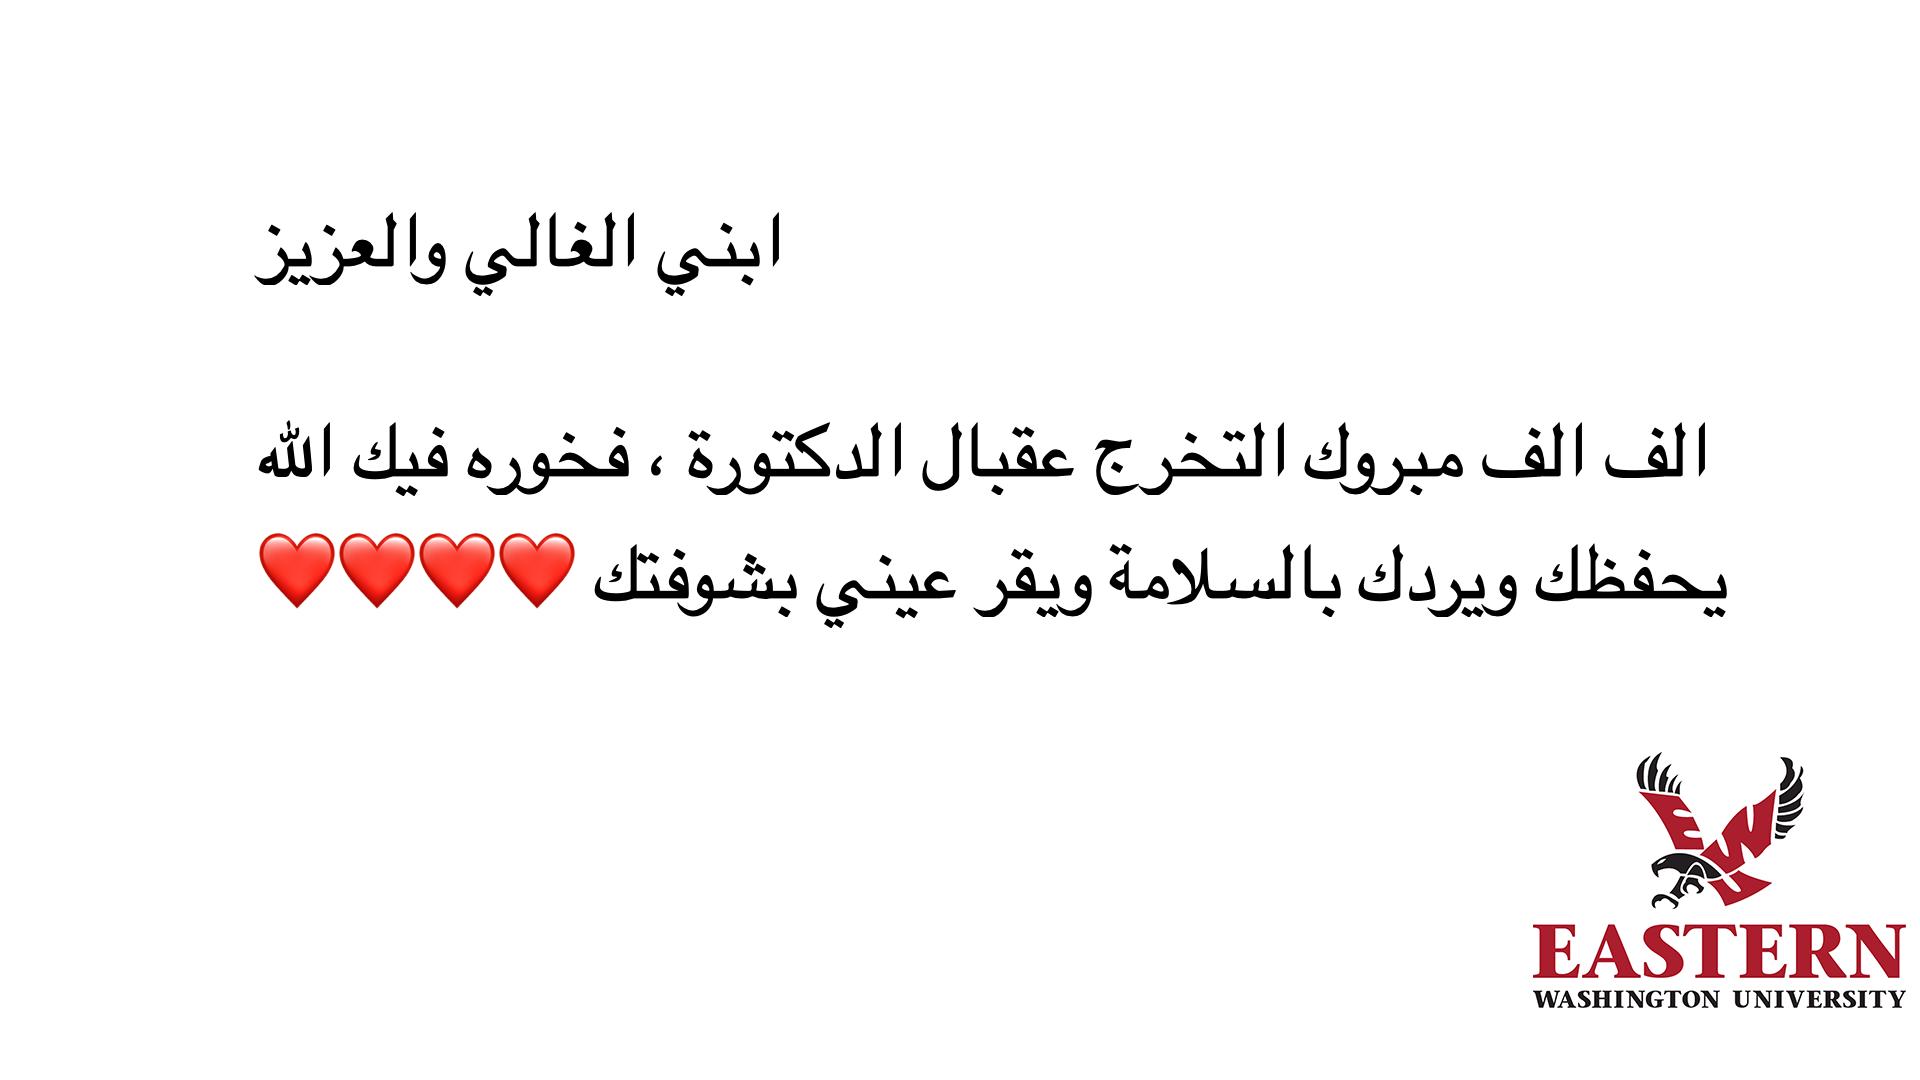 tbi_rakan-mohammed-a-alfayadh_5499.png